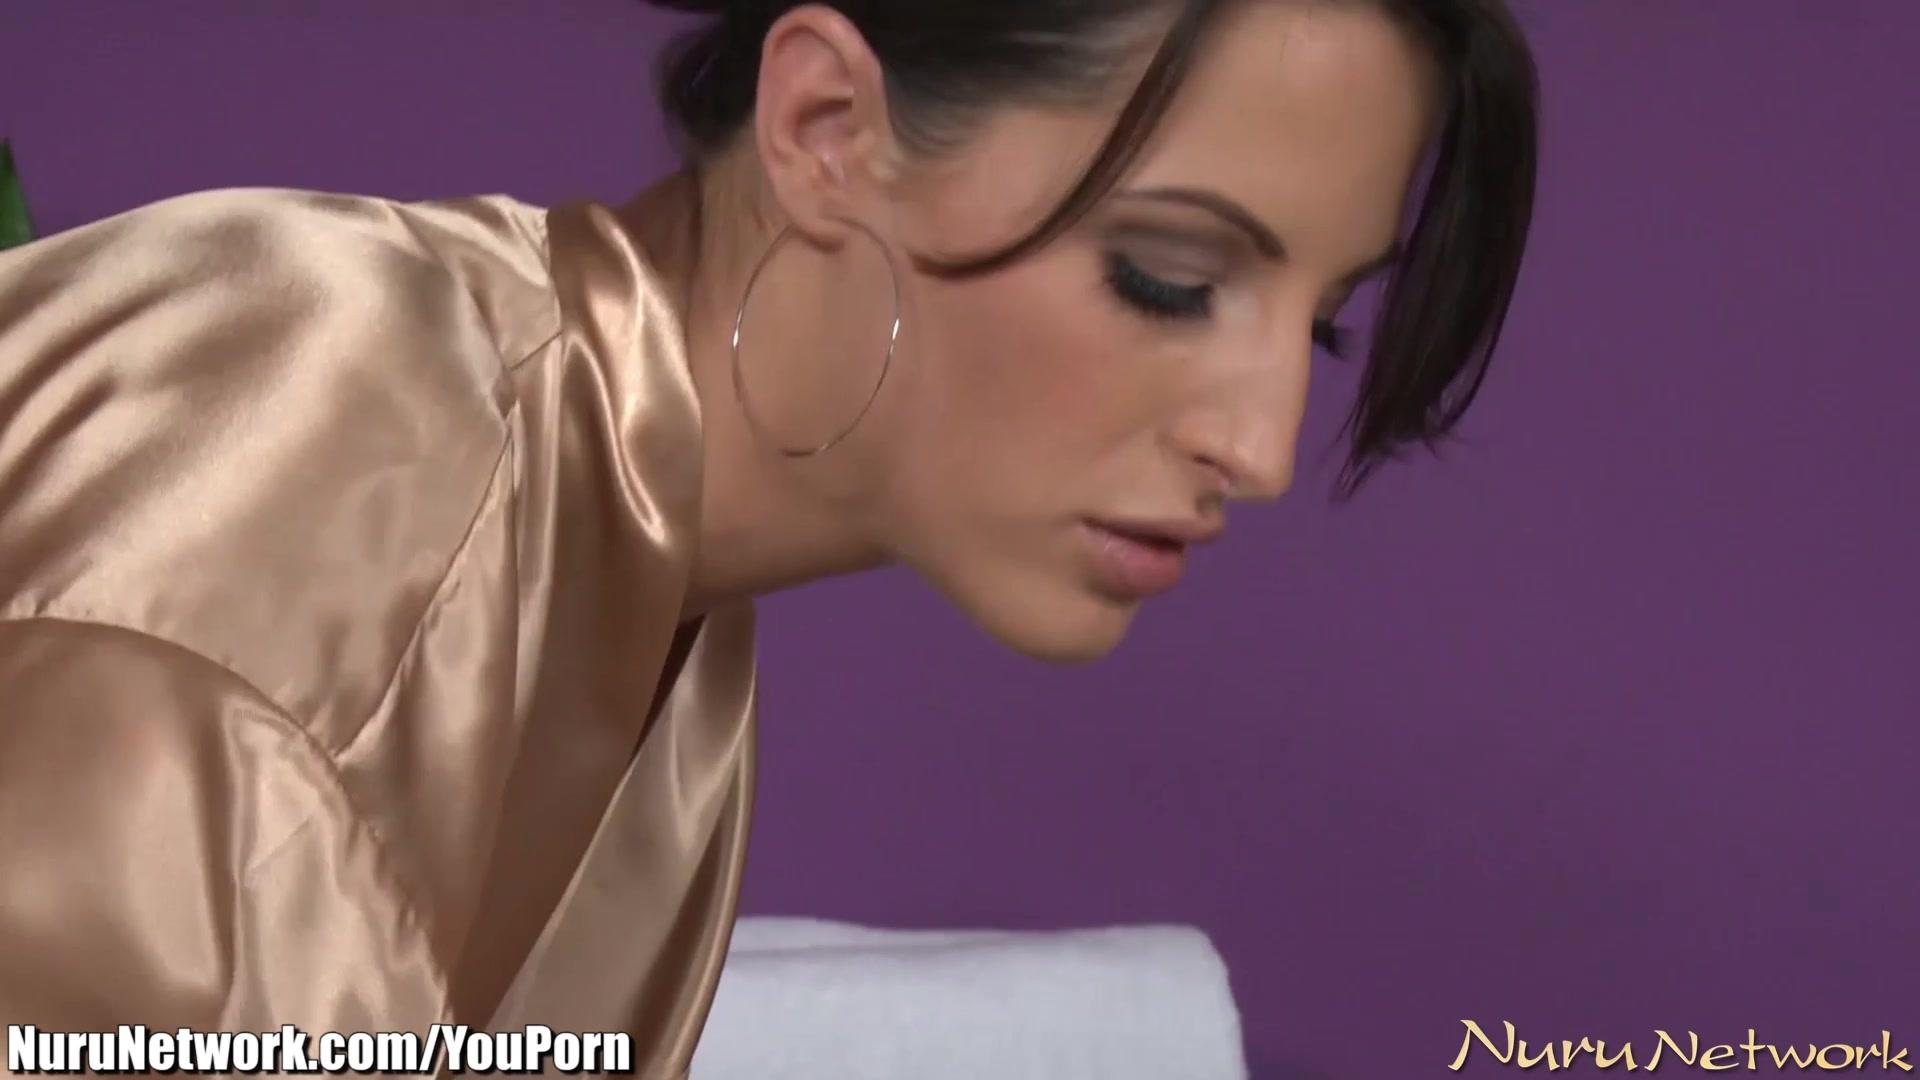 NuruNetwork Tiny Teen Seduced in a Lesbian Massage